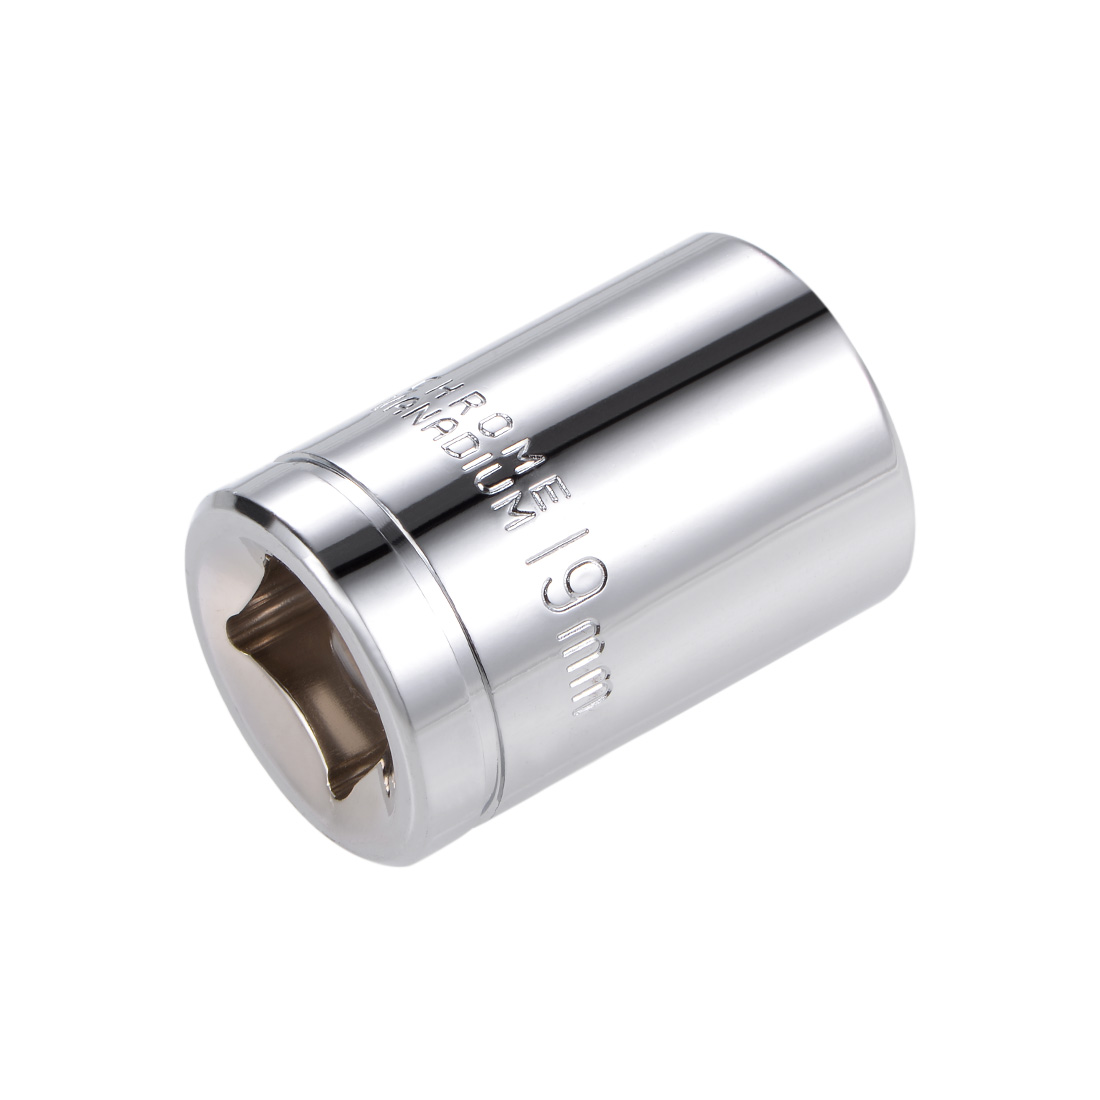 1/2-inch Drive E19 Universal Spline Socket Shallow 12 Point Cr-V Steel